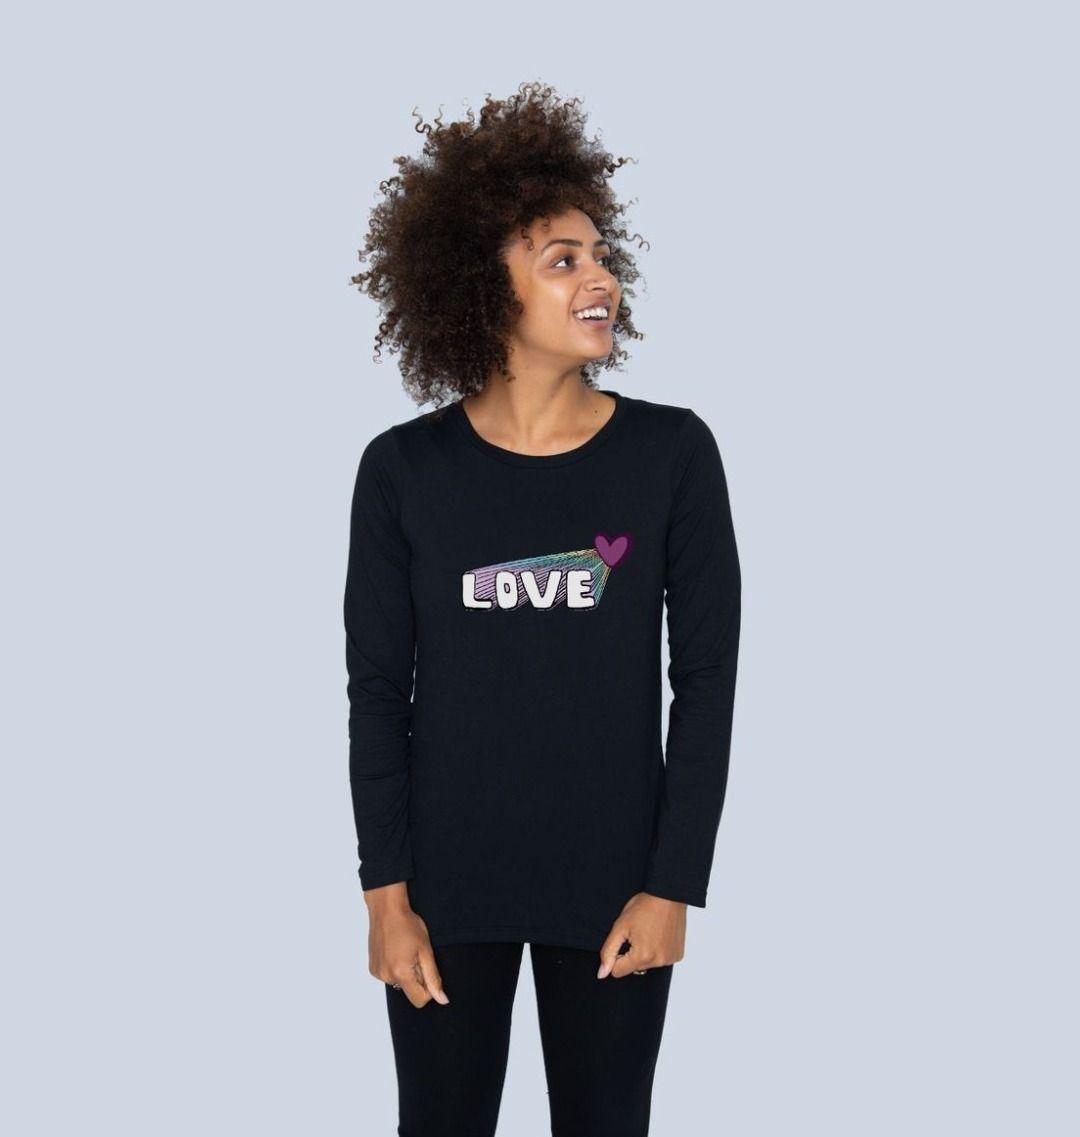 Women's Let Your Love Shine Longsleeve Top Kind Shop 4